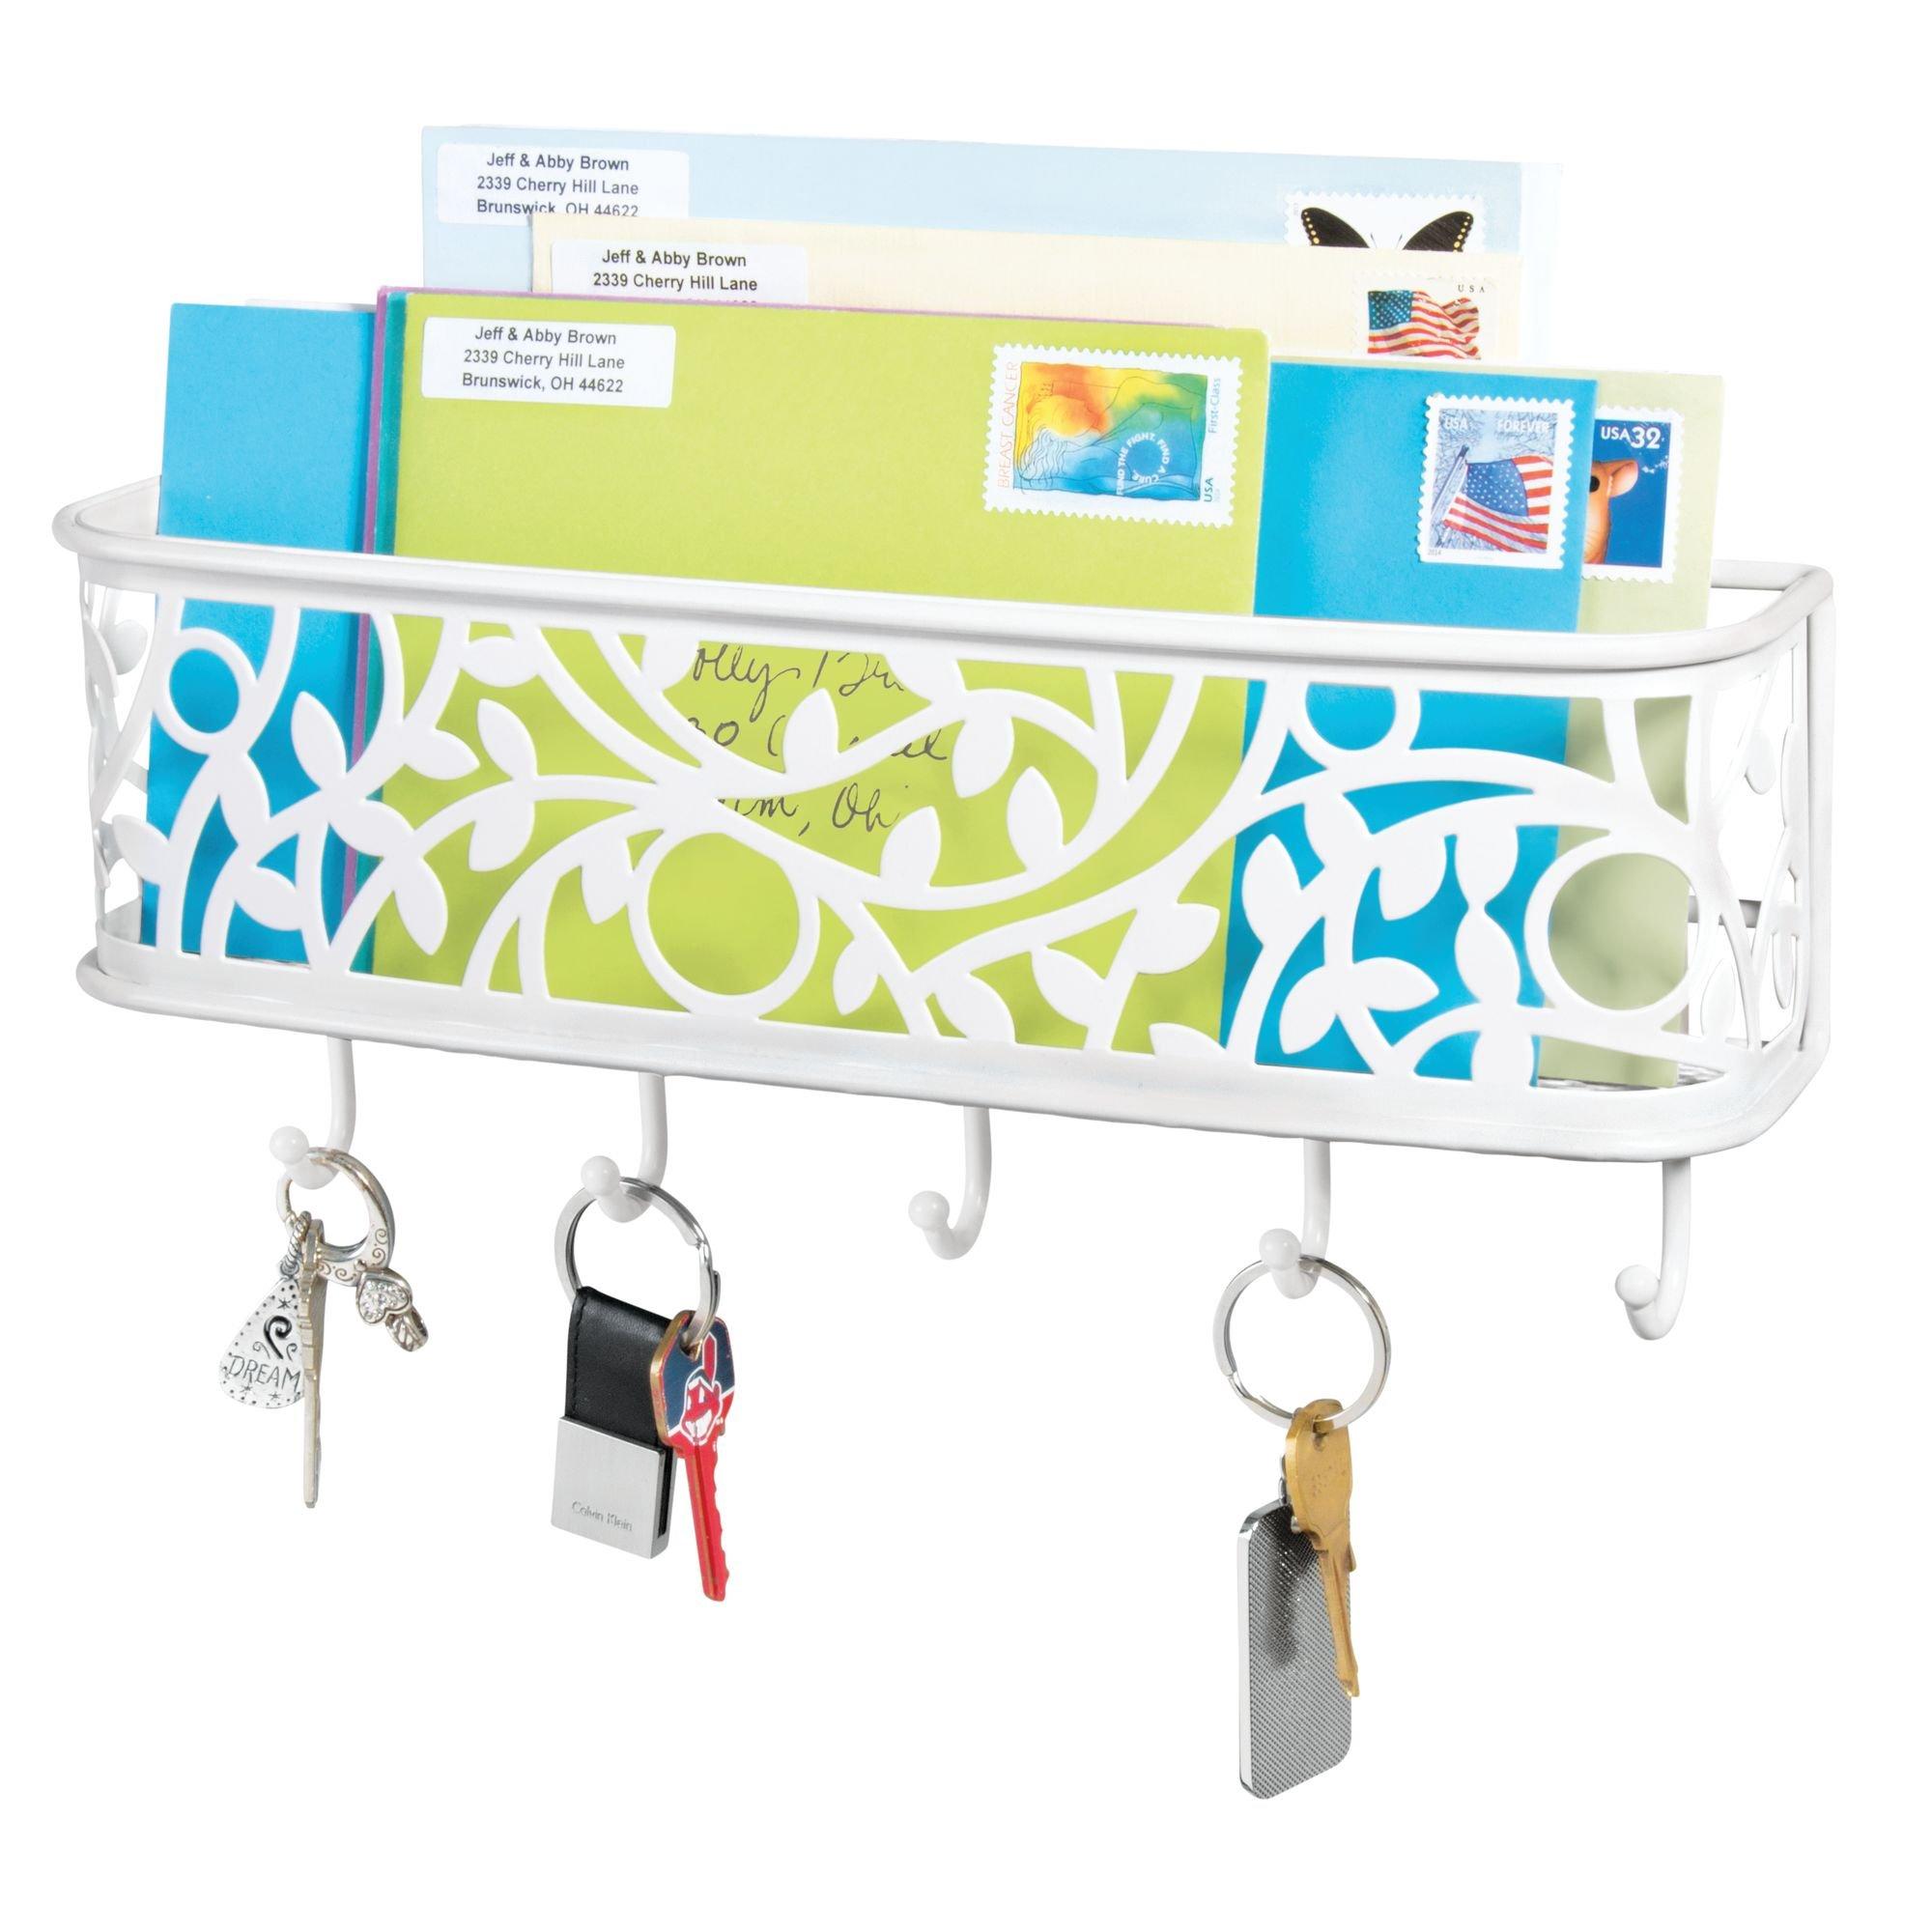 mDesign Wall Mounted Metal Decorative Hanging Entryway Kitchen Mail Holder Storage Station and Keys Rack Organizer - Matte White